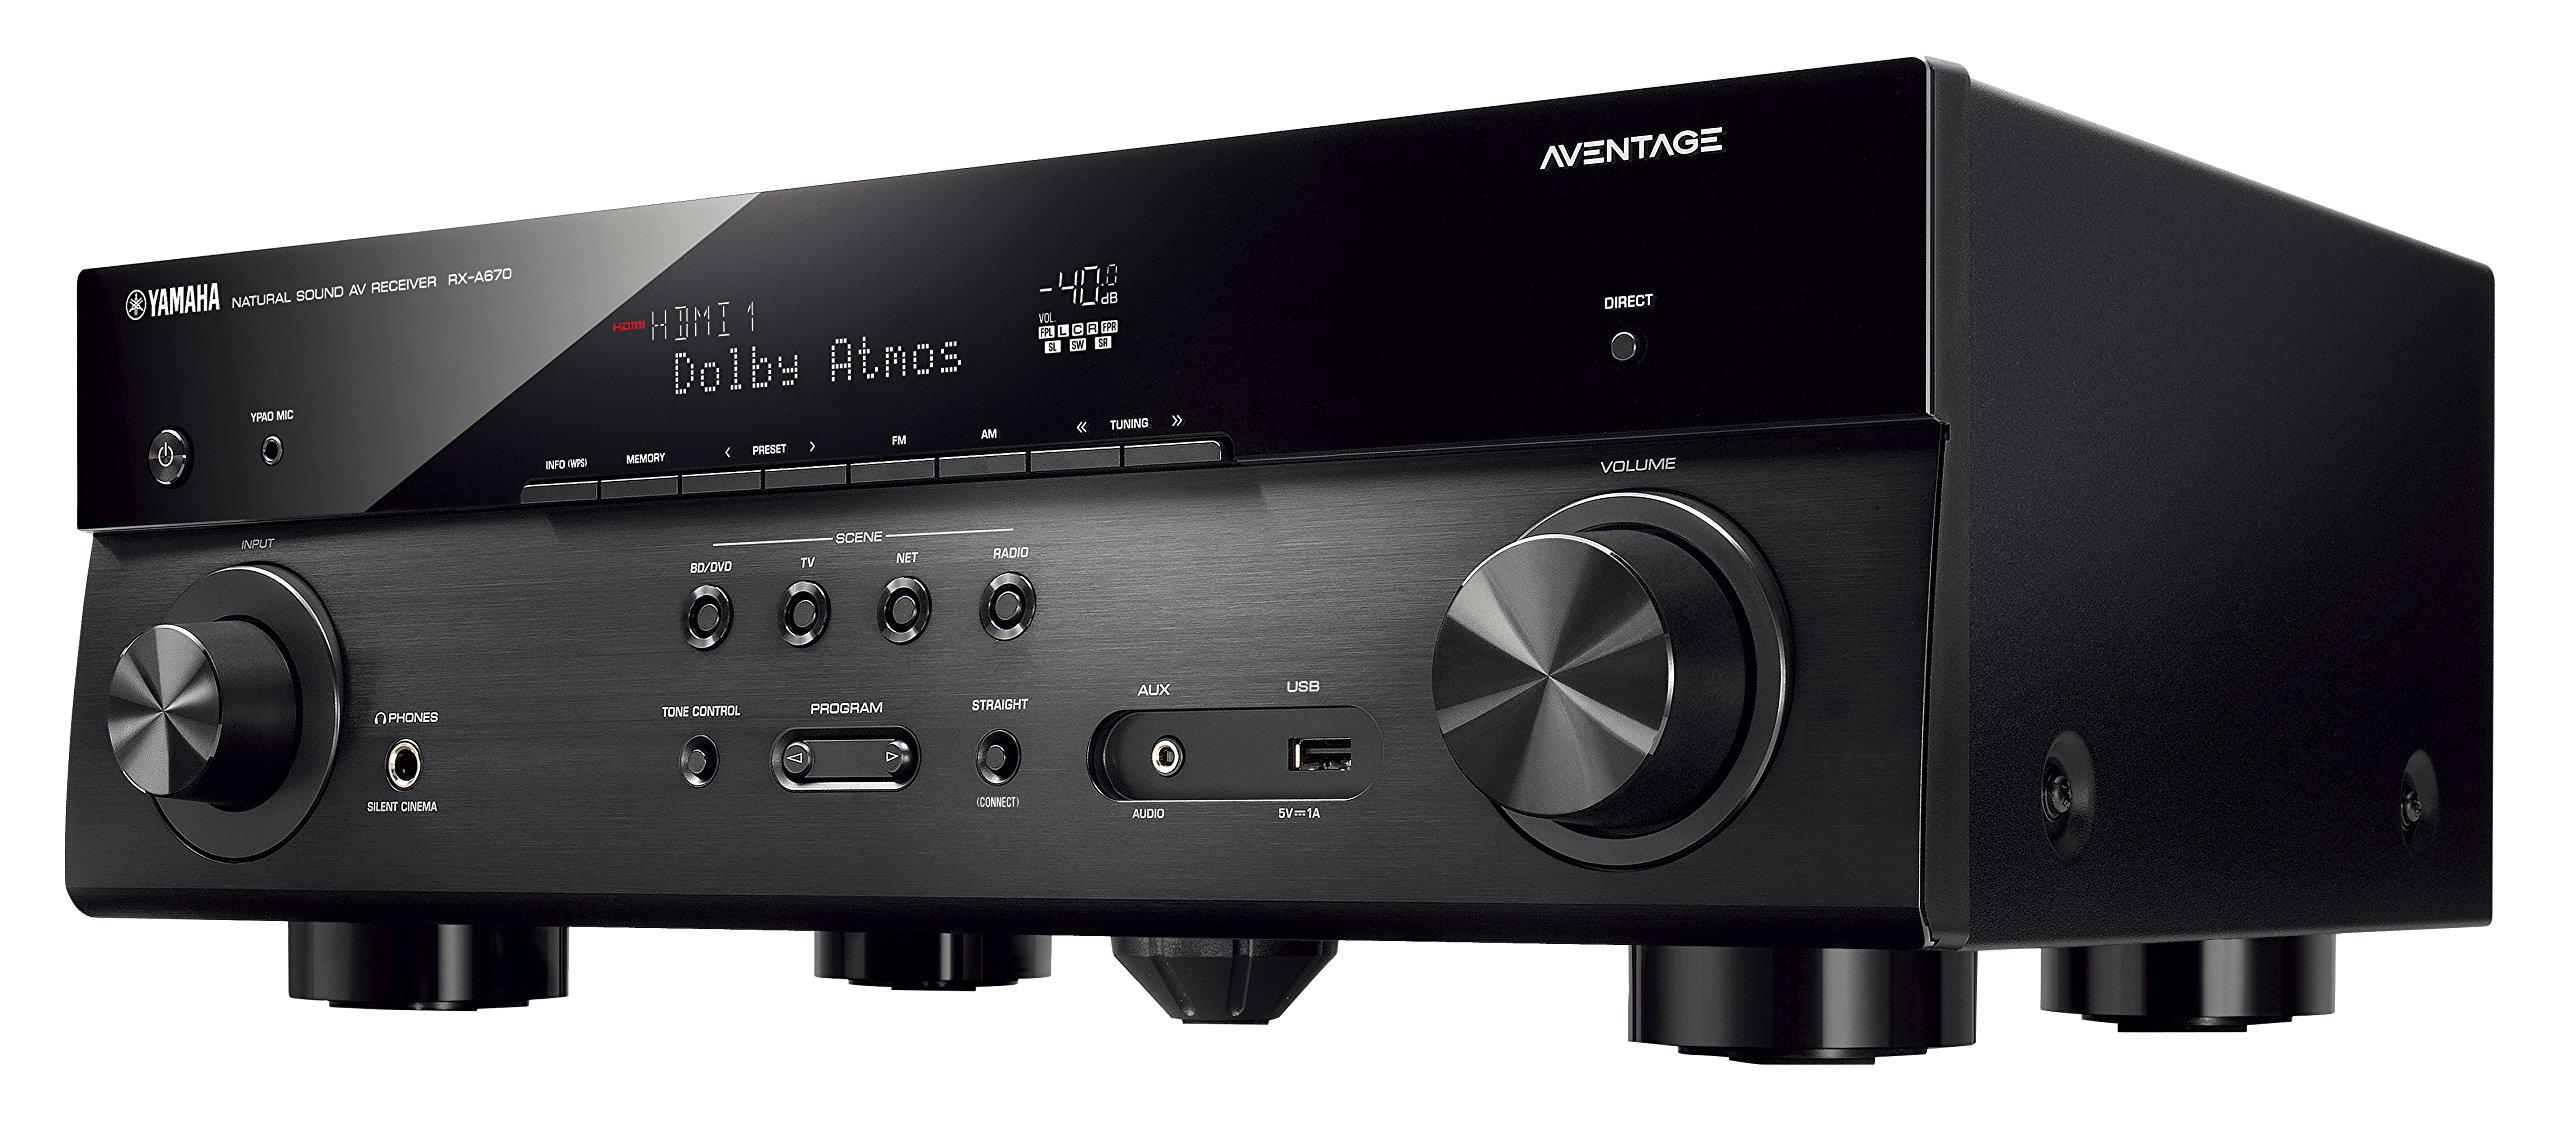 Yamaha AVENTAGE Audio & Video Component Receiver,Black (RX-A670BL)